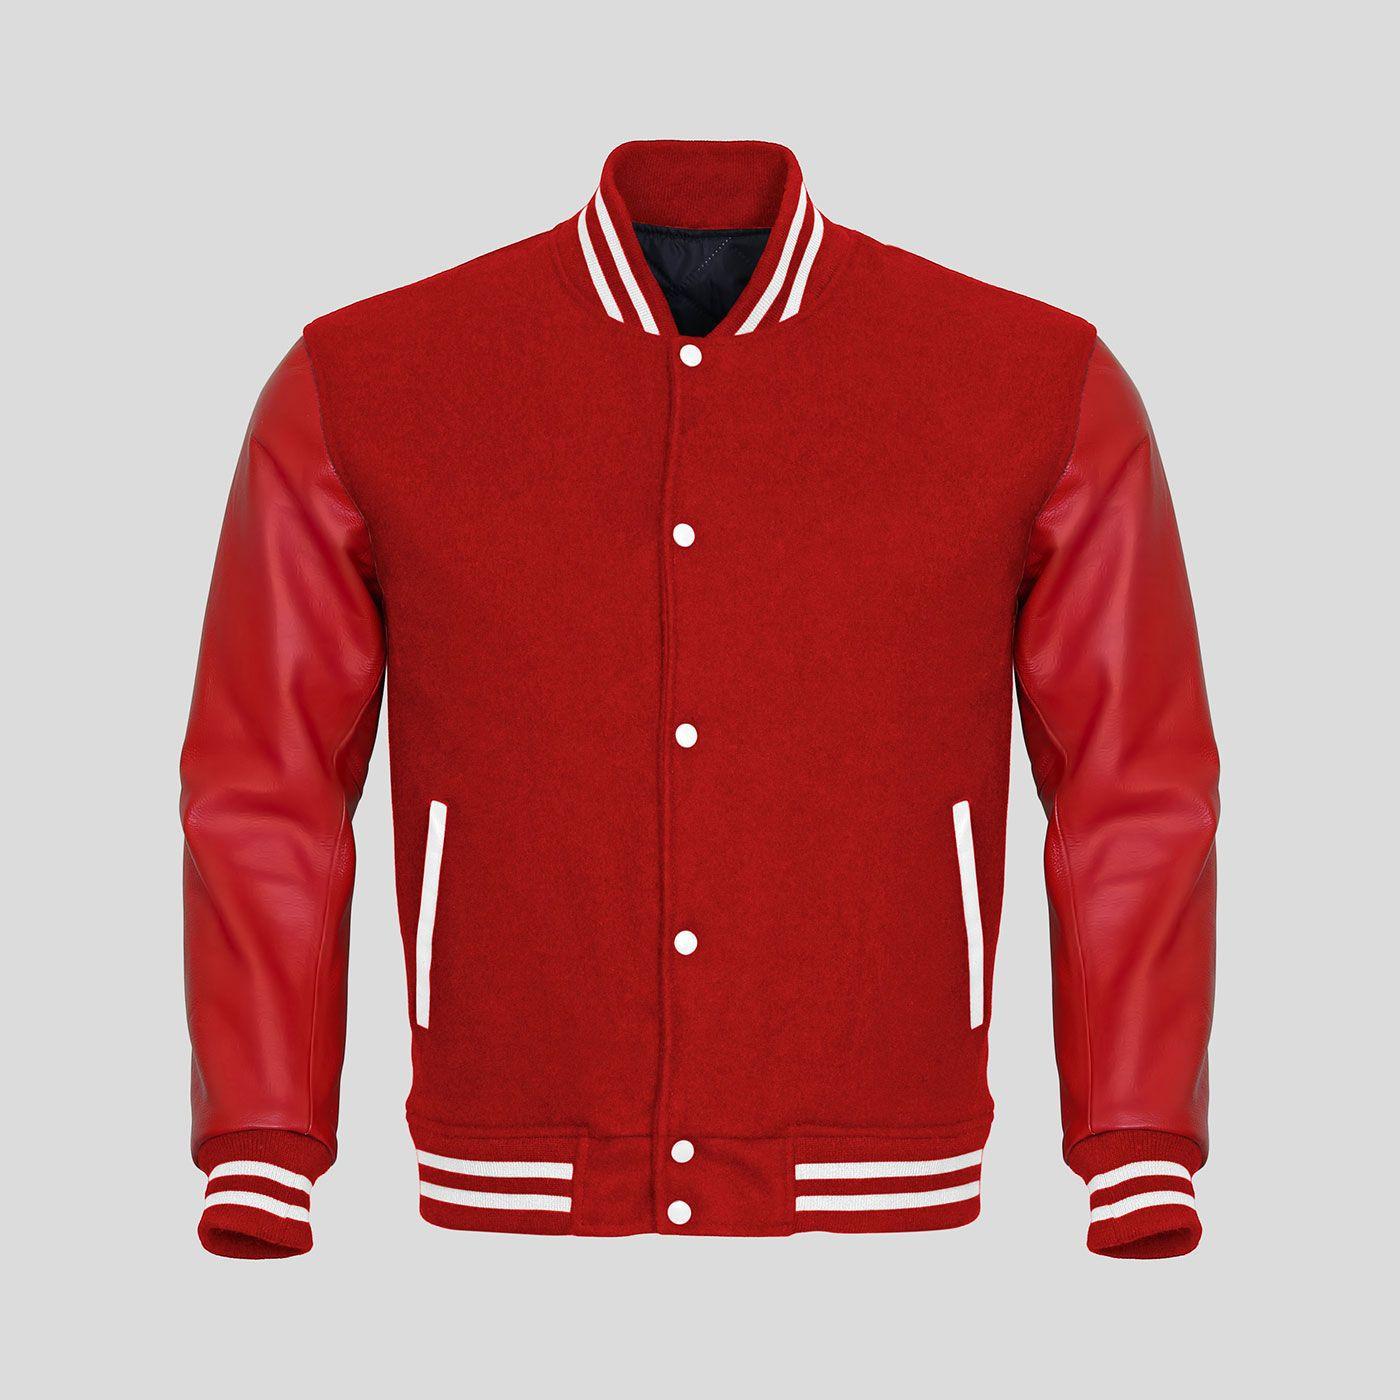 Red Faux Leather Sleeves Red Wool Varsity Jacket Custom